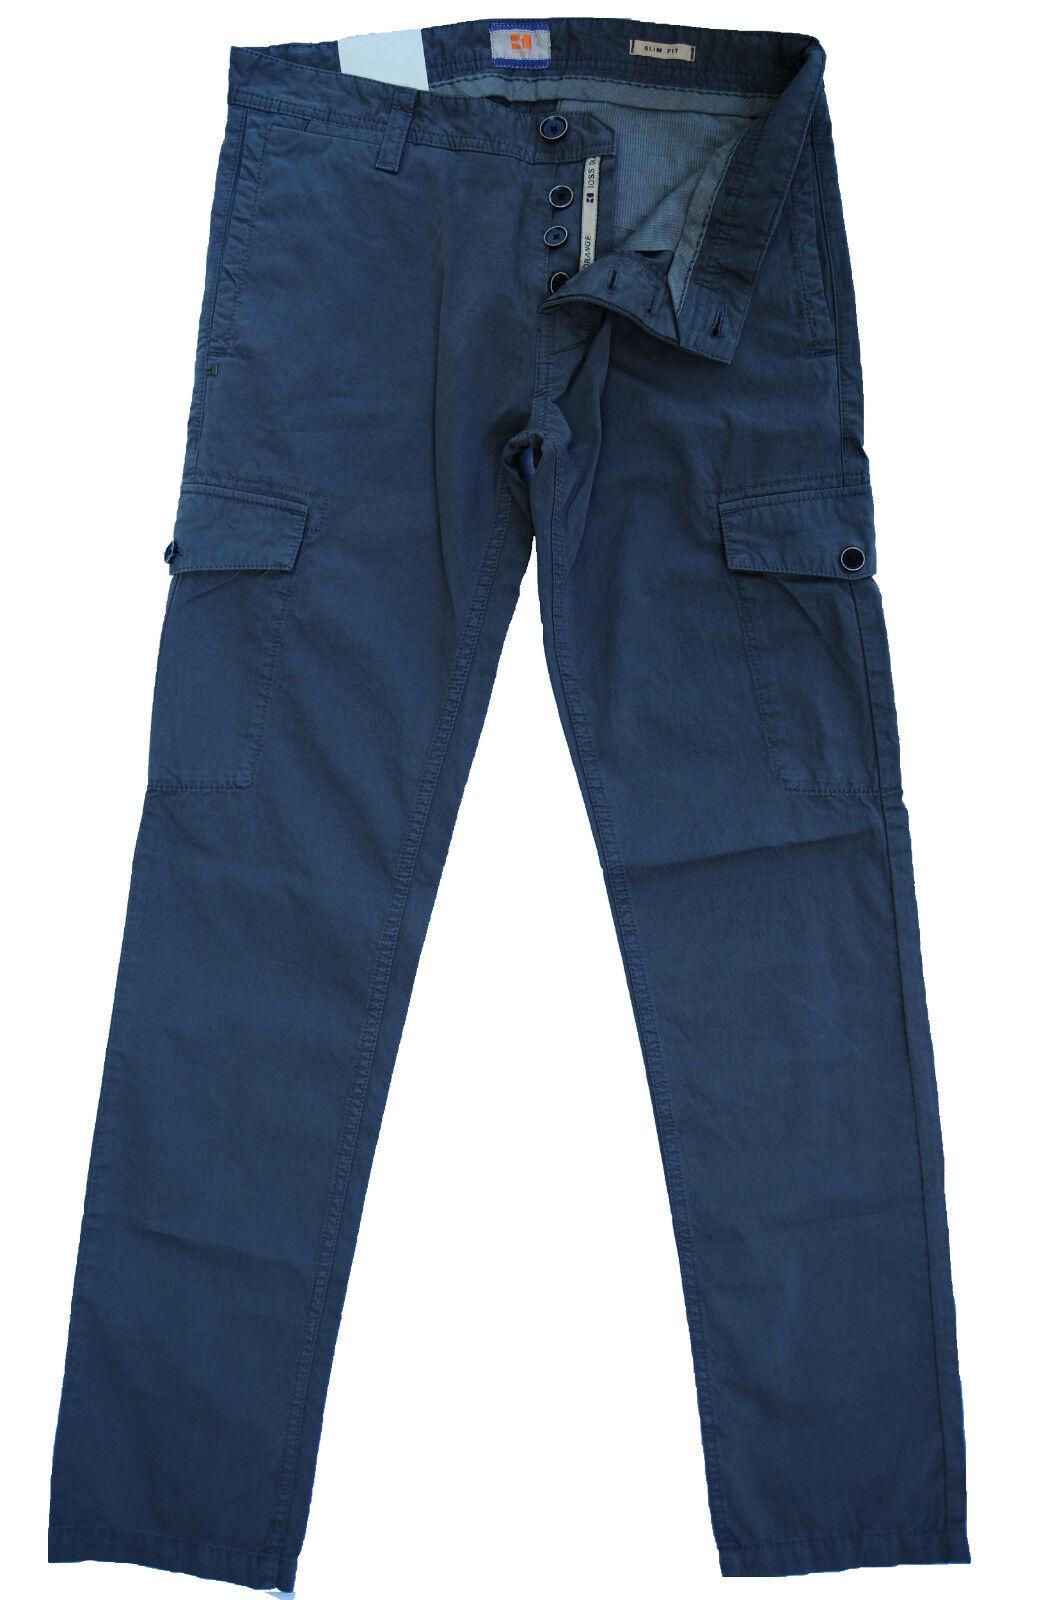 Neuf 32 34 Slim Fit spinok-D hugo boss jeans pantalon vintage Tribute 50225658